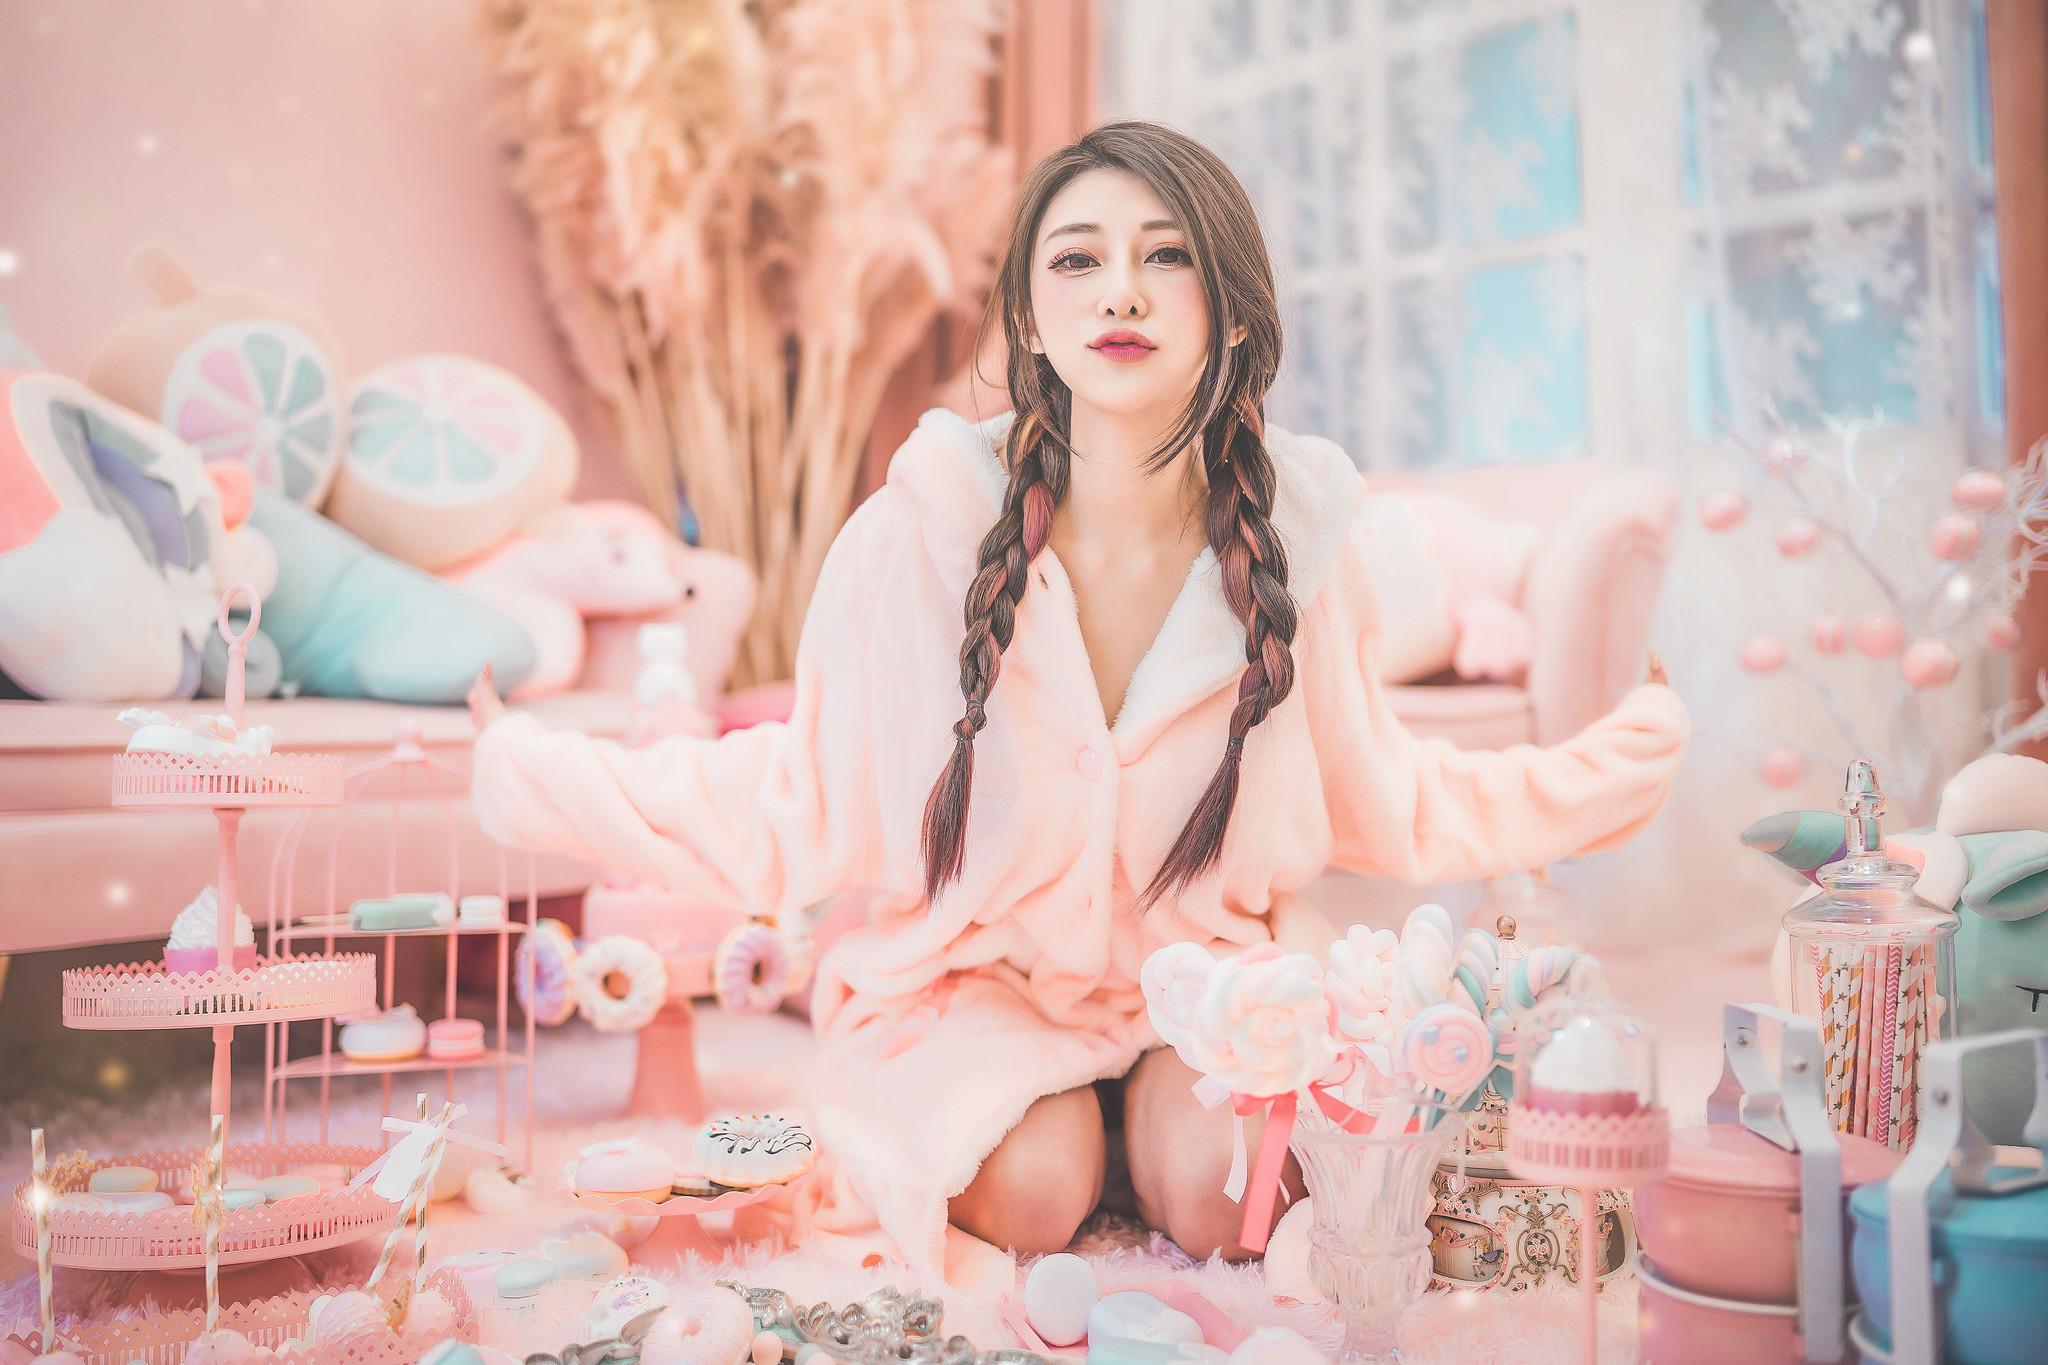 People 2048x1365 colorful Asian women model long hair women indoors